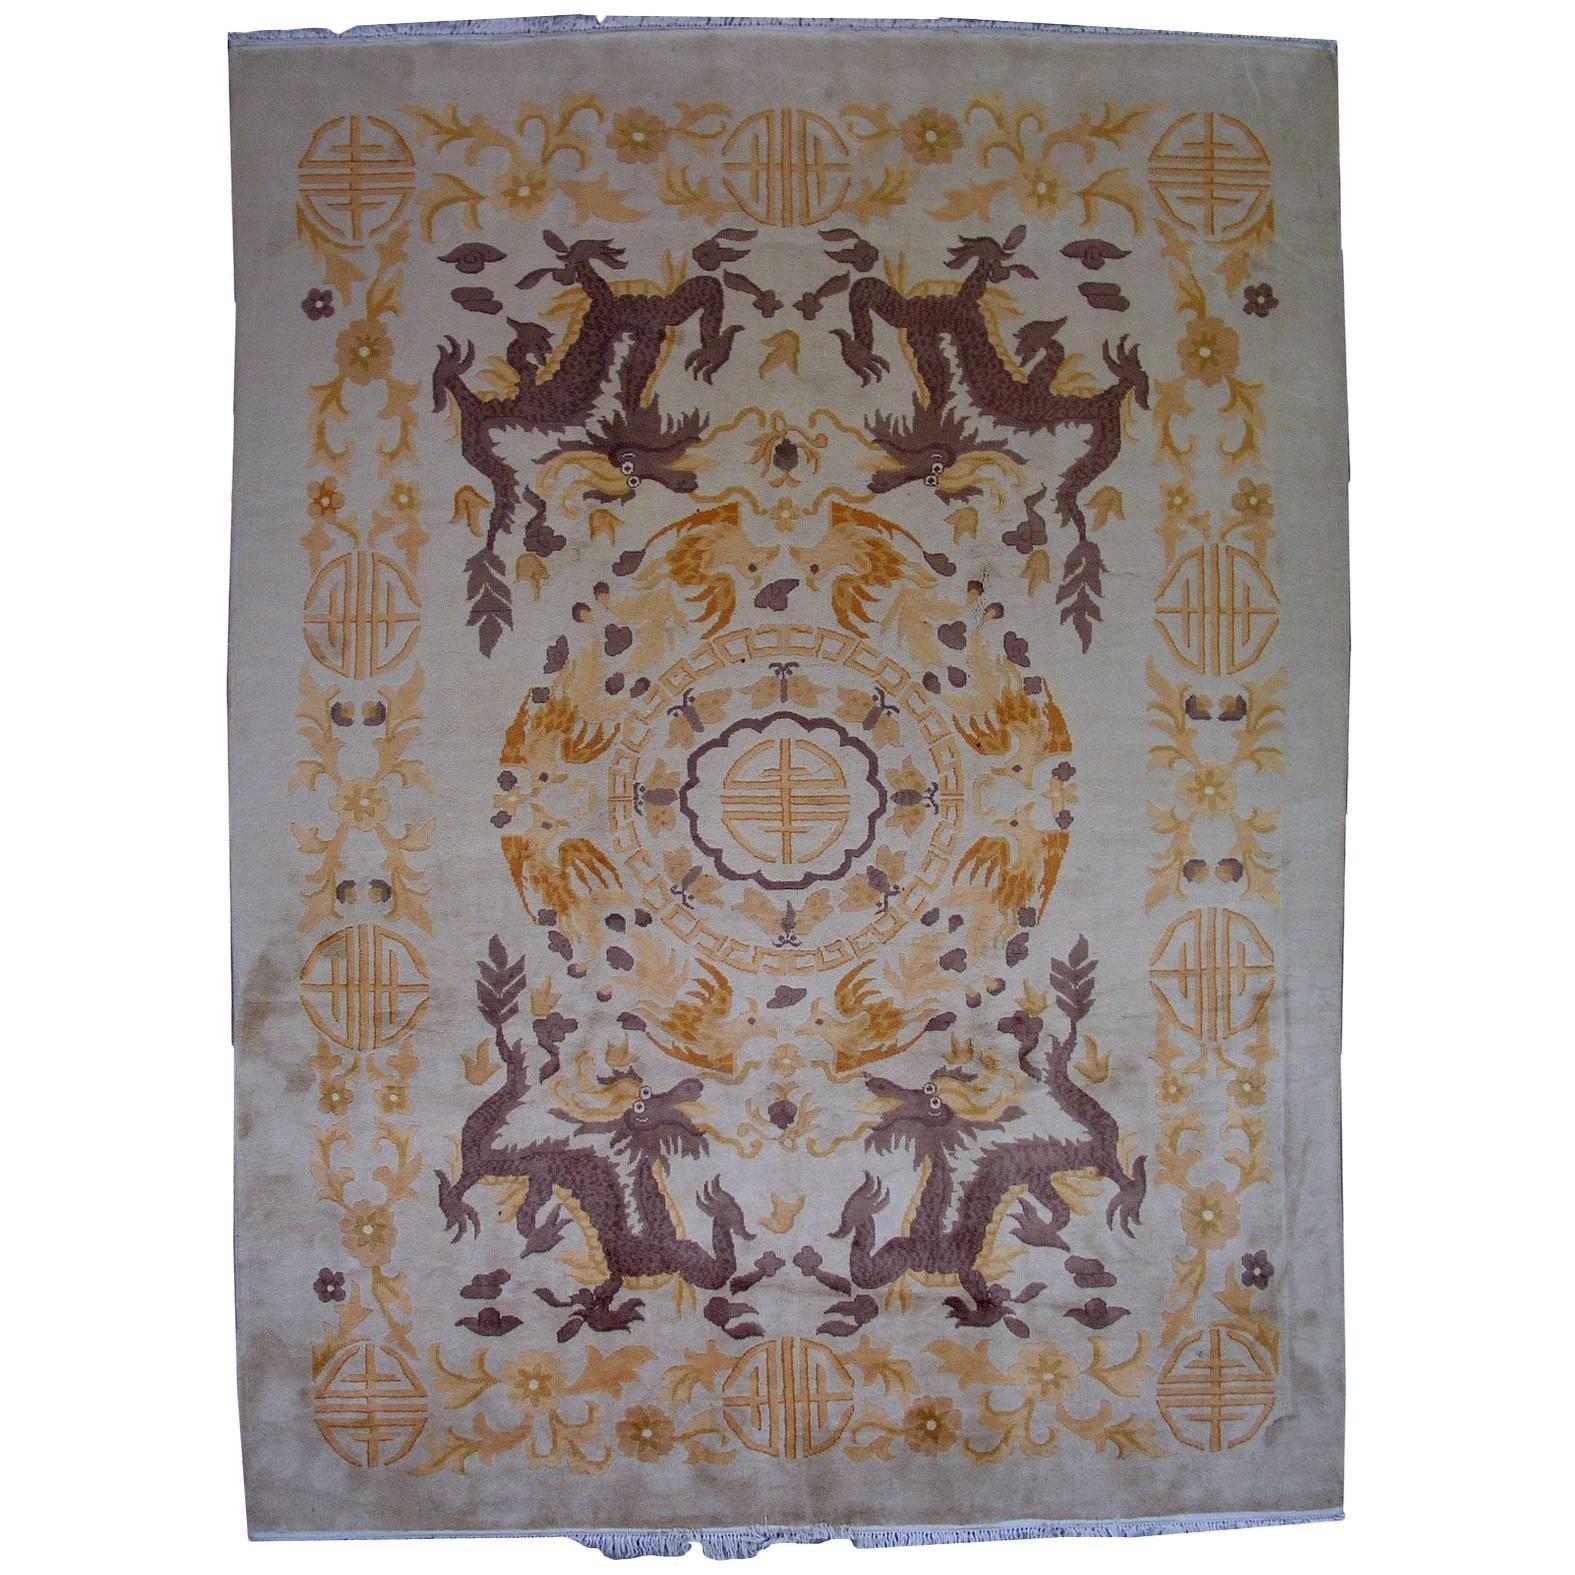 Handmade Antique Chinese Art Deco Rug, 1930s, 1L04